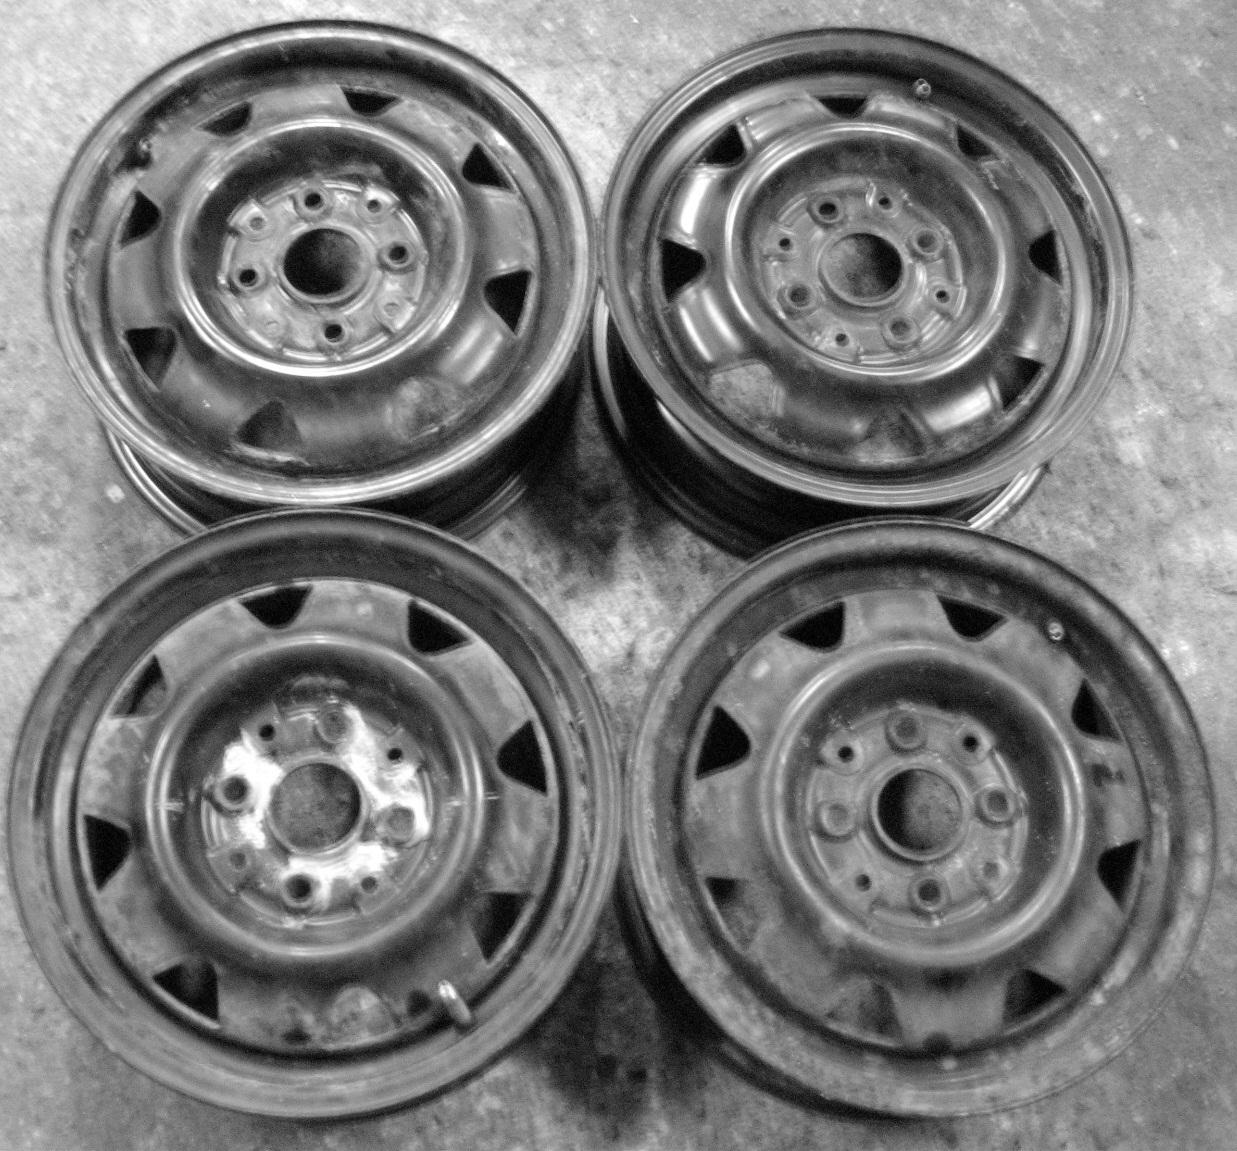 "Plechové-Ocelové-disky-bazar - 14"" Audi 80 4x108 sada"